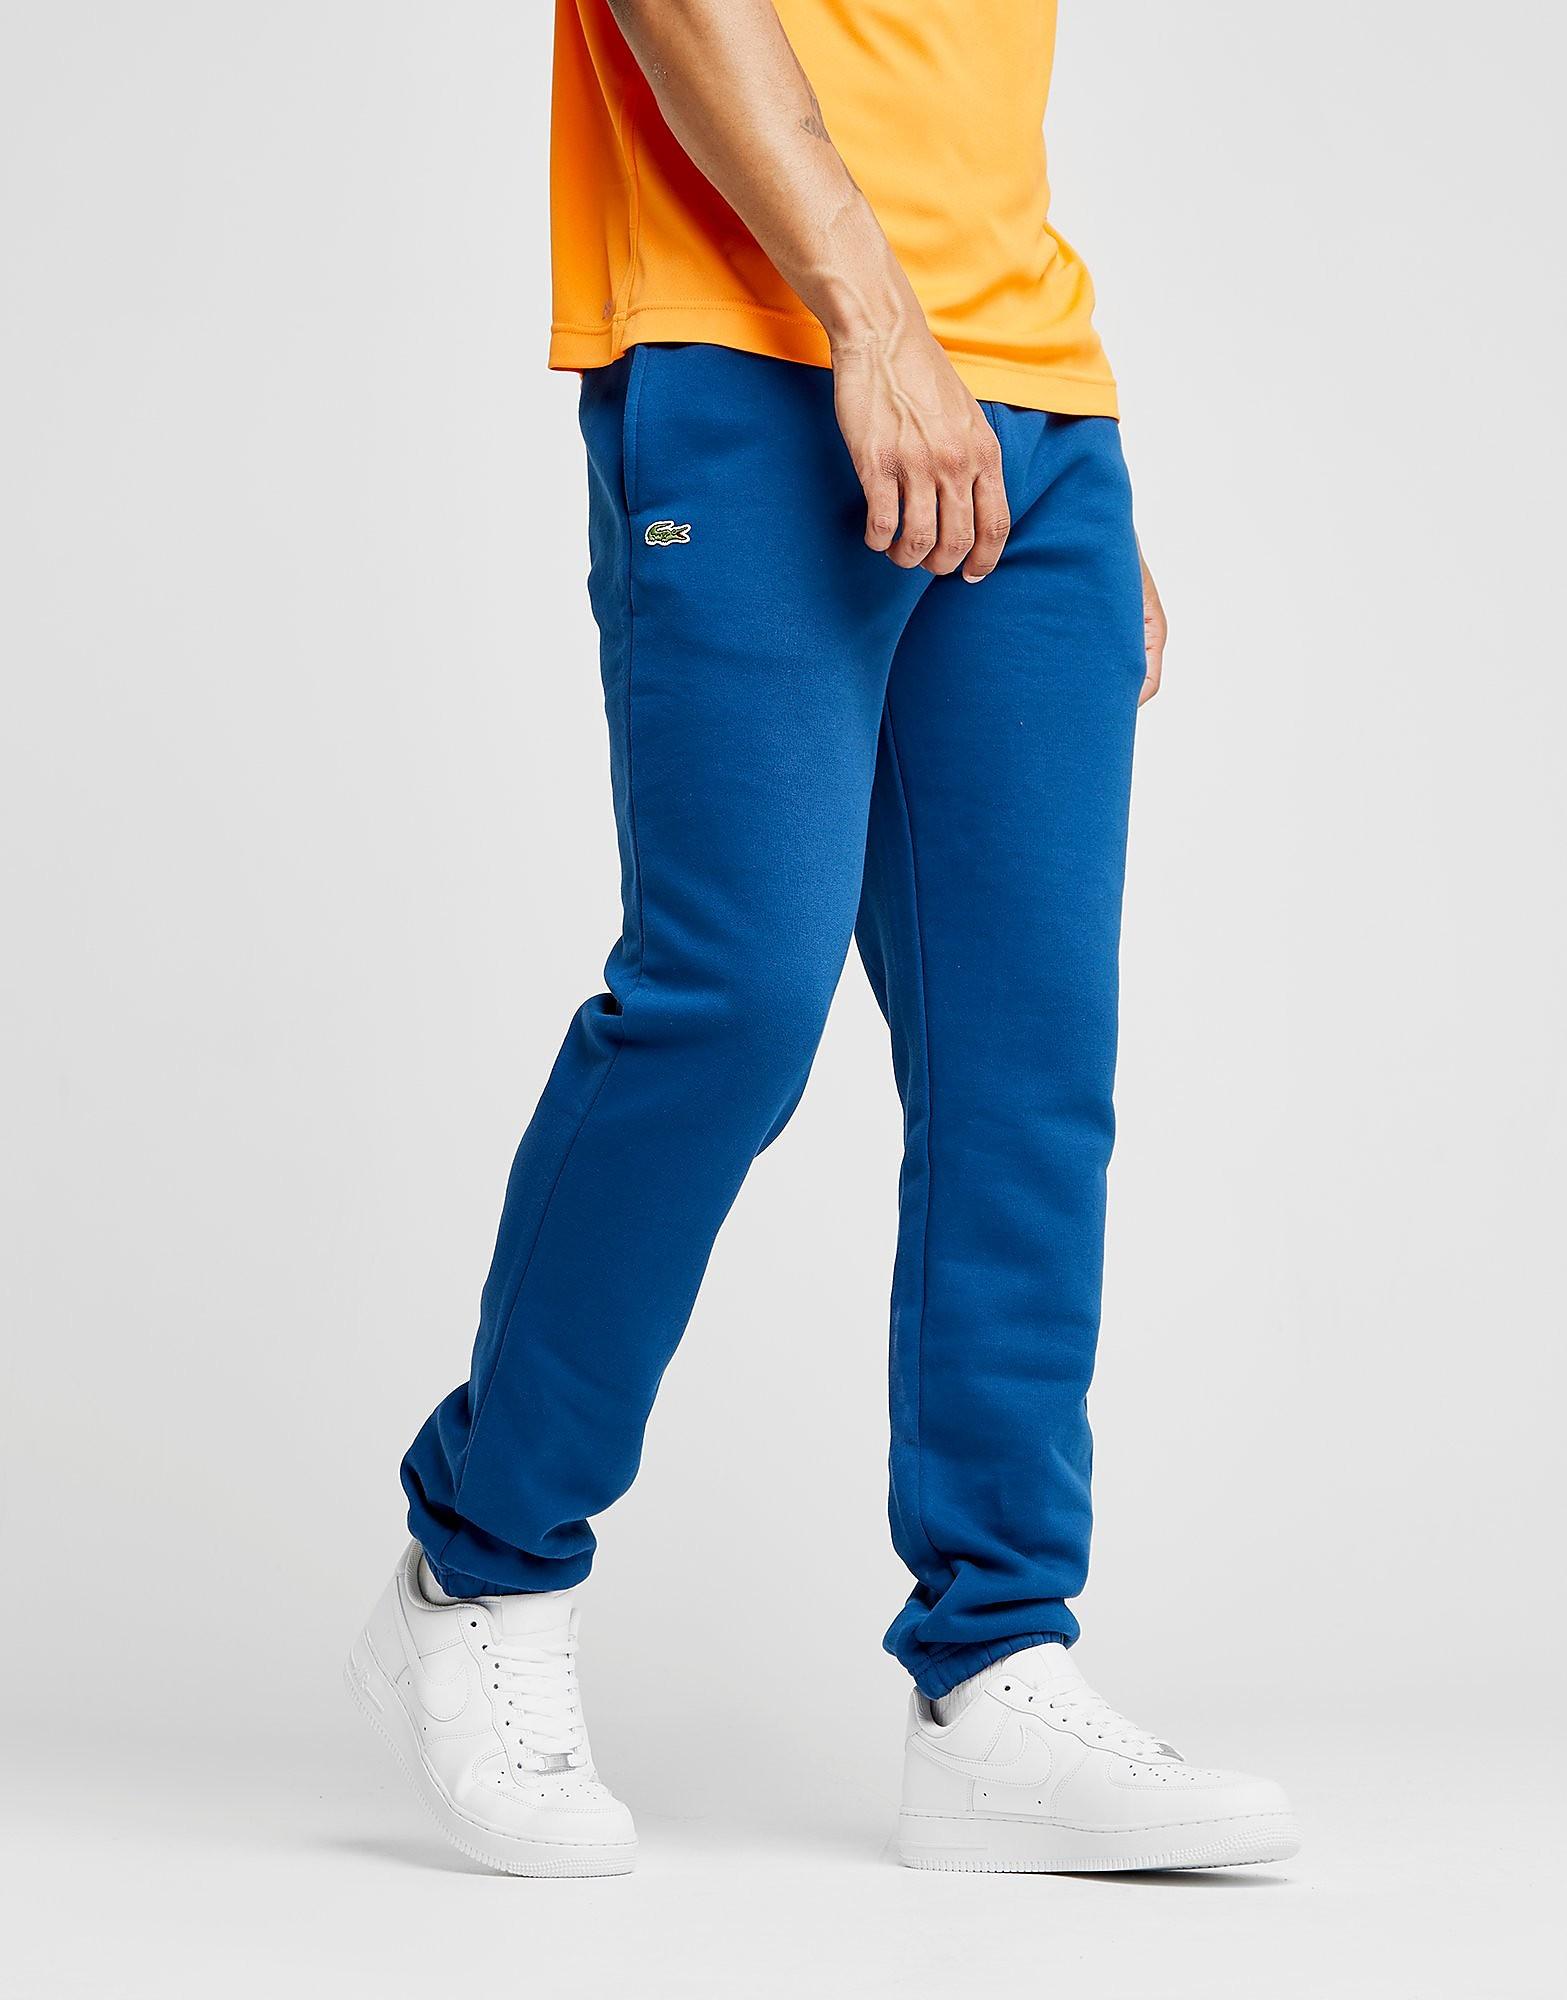 Lacoste Fleece Core Pants